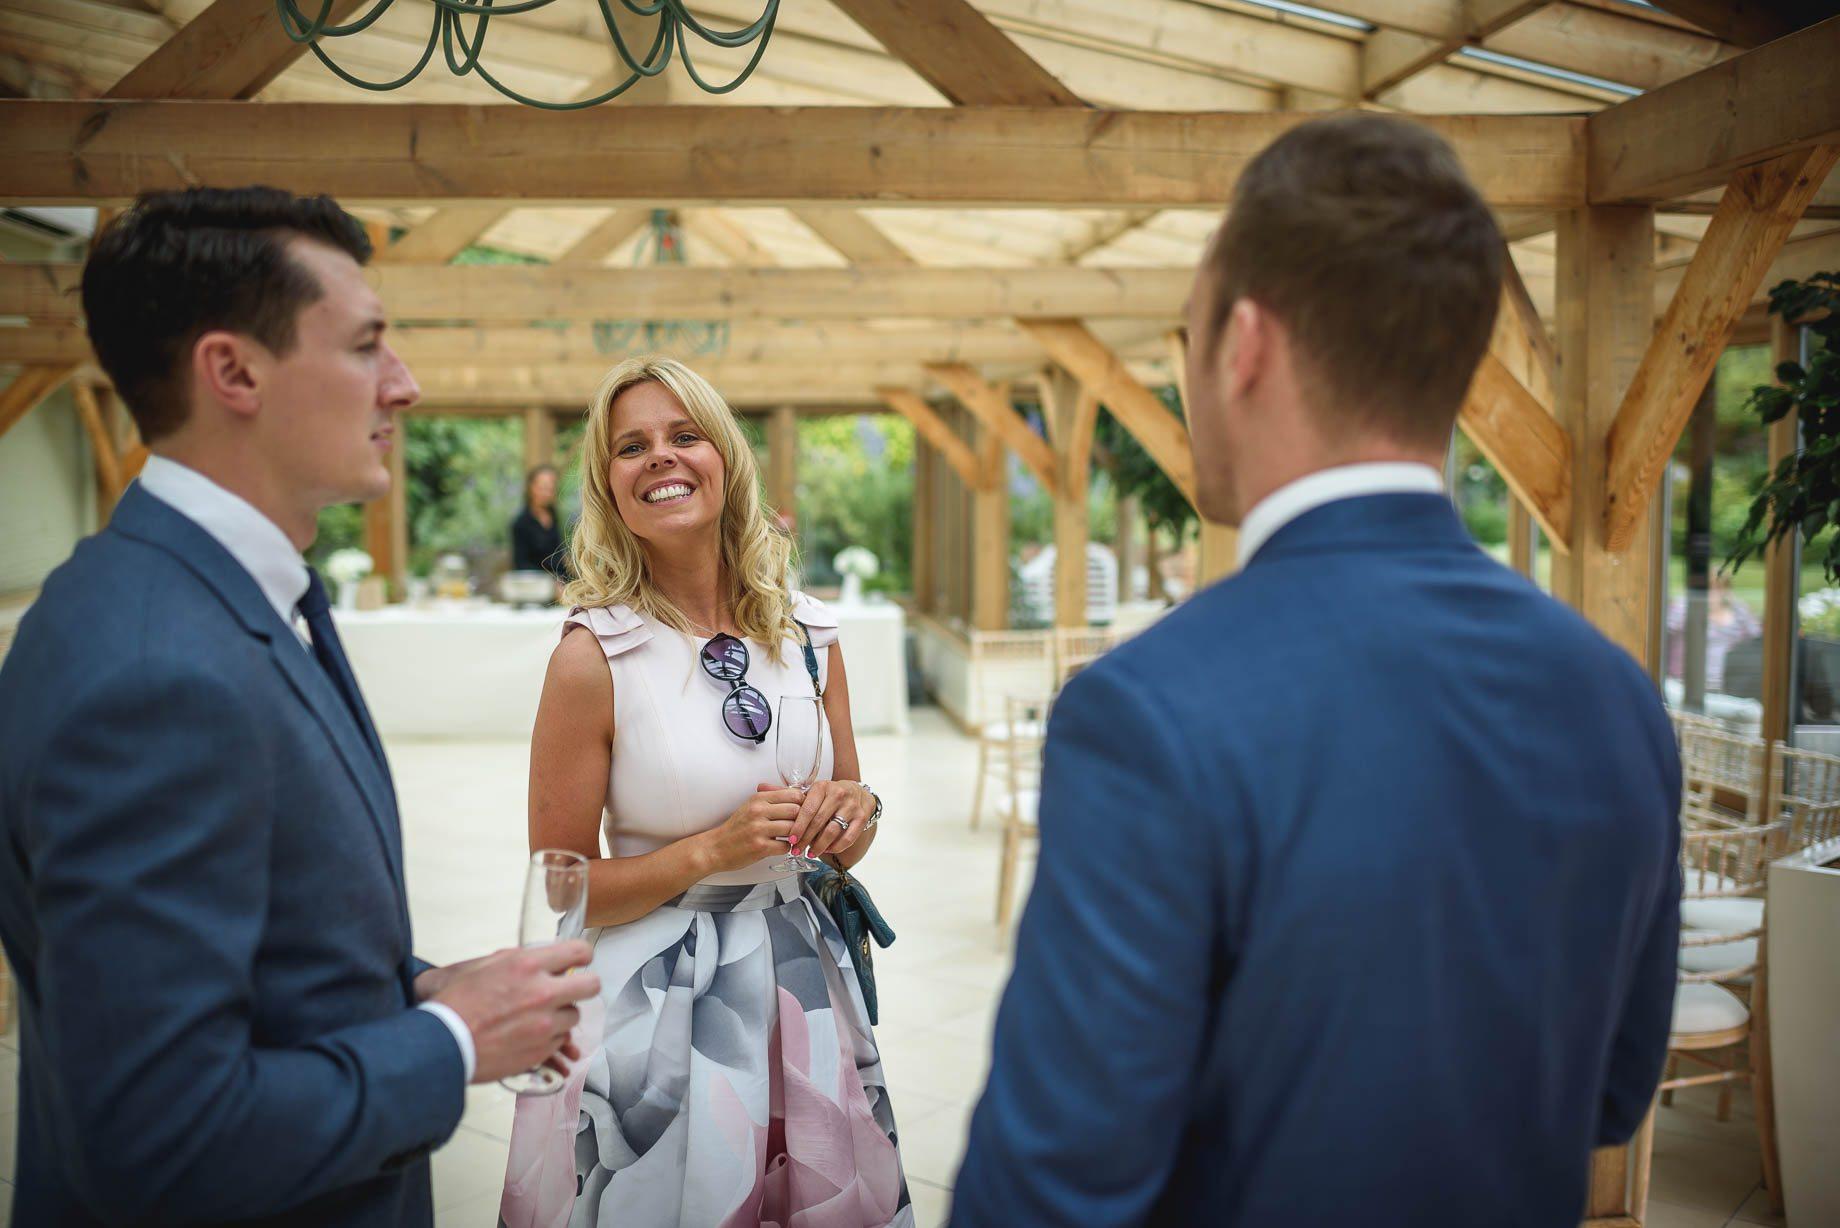 Gaynes Park wedding photography - Guy Collier Photography - Rachel and Jon (98 of 169)